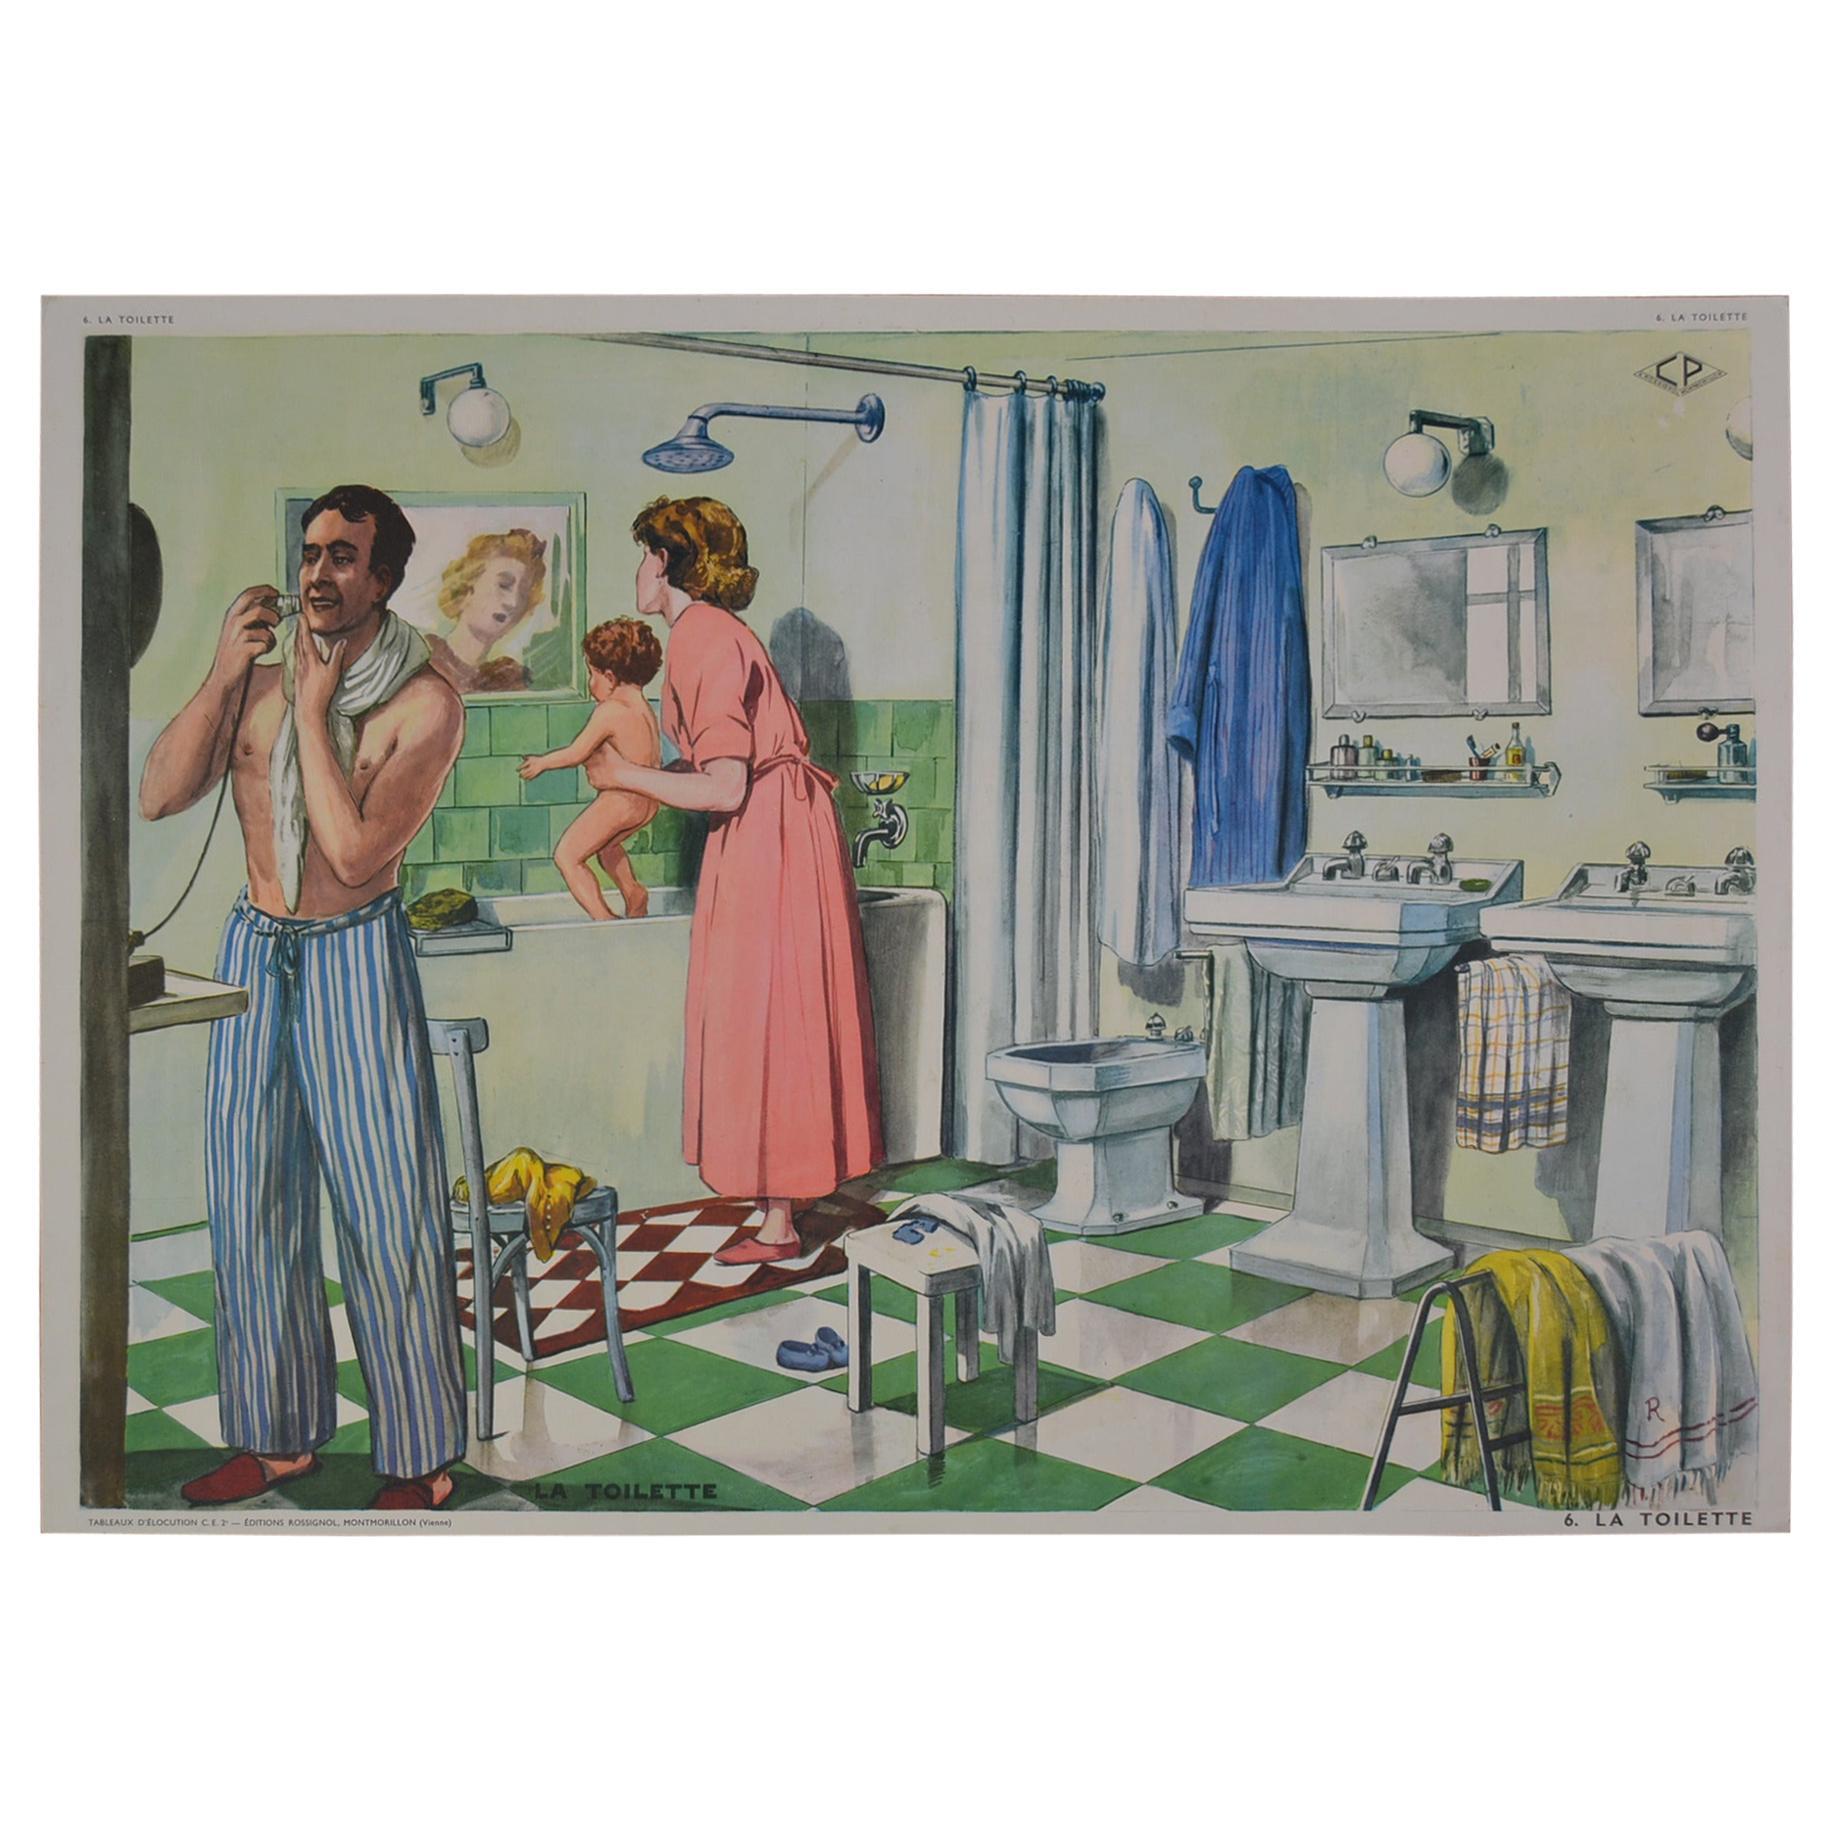 1960s School Poster, Art Deco Bathroom by Rossignol